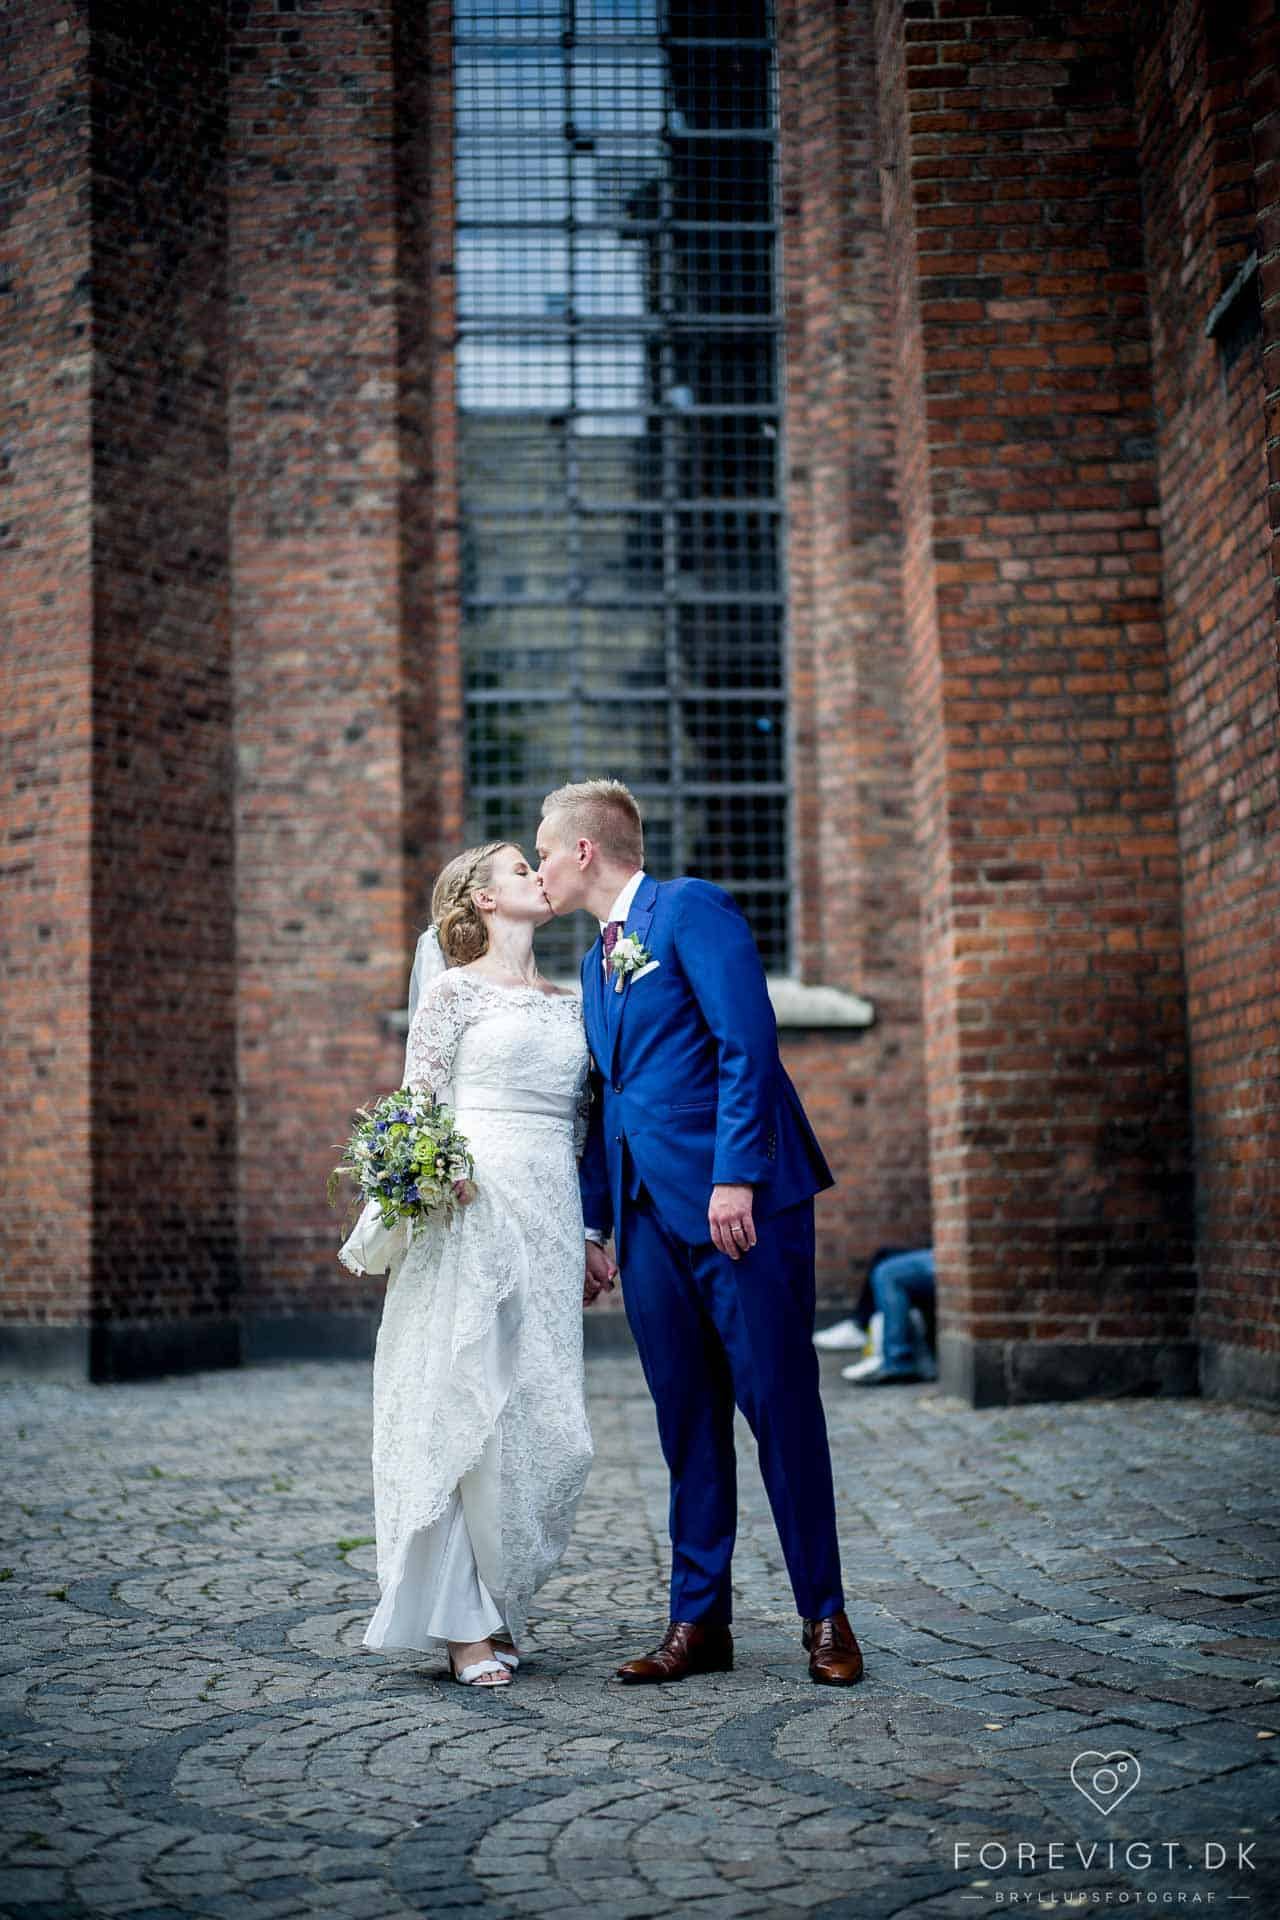 Uddannet fotojournalist med passion for bryllupper